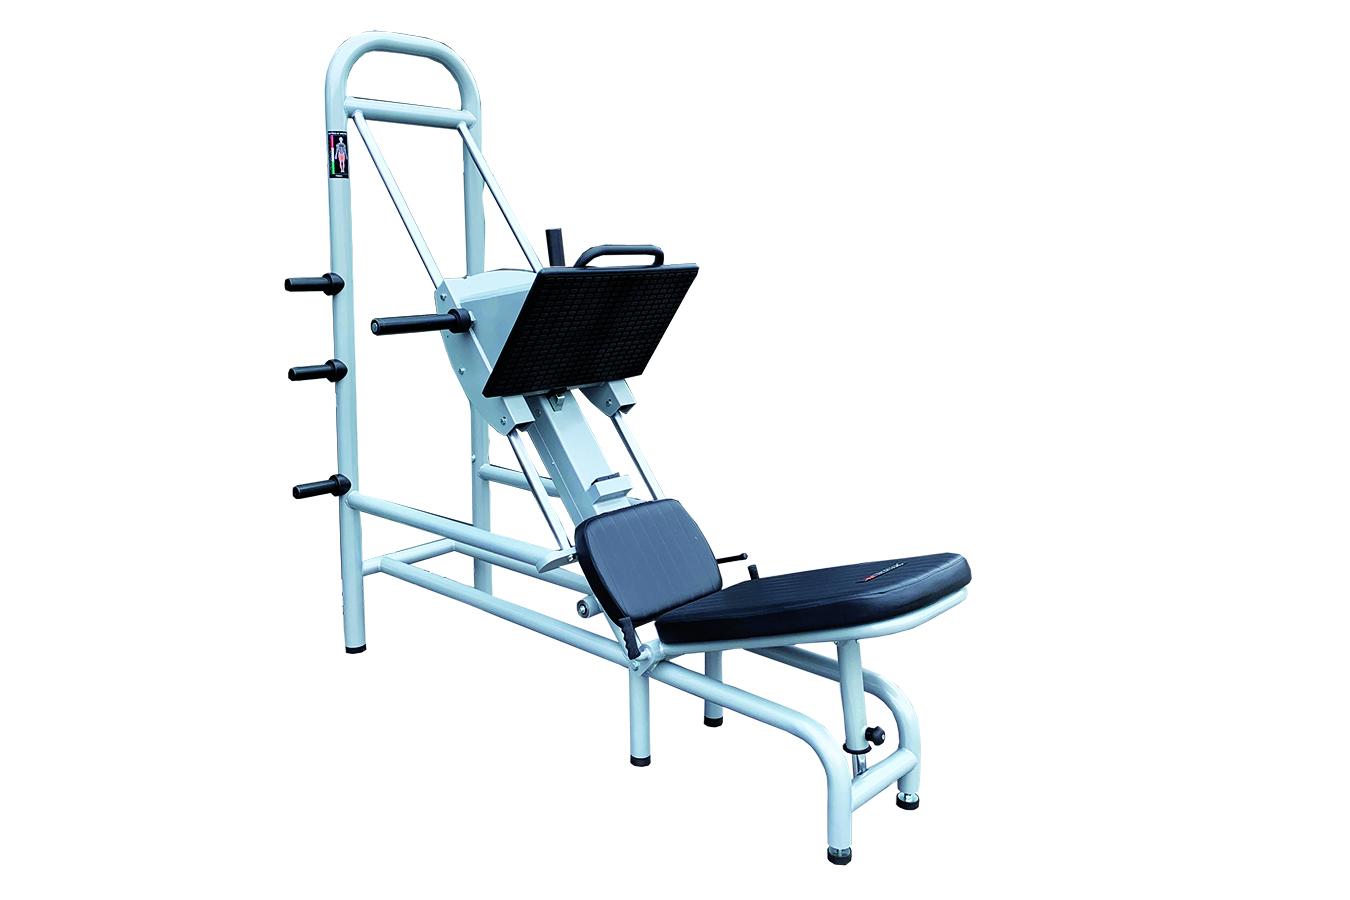 45° Leg Press Machine Crossbowline